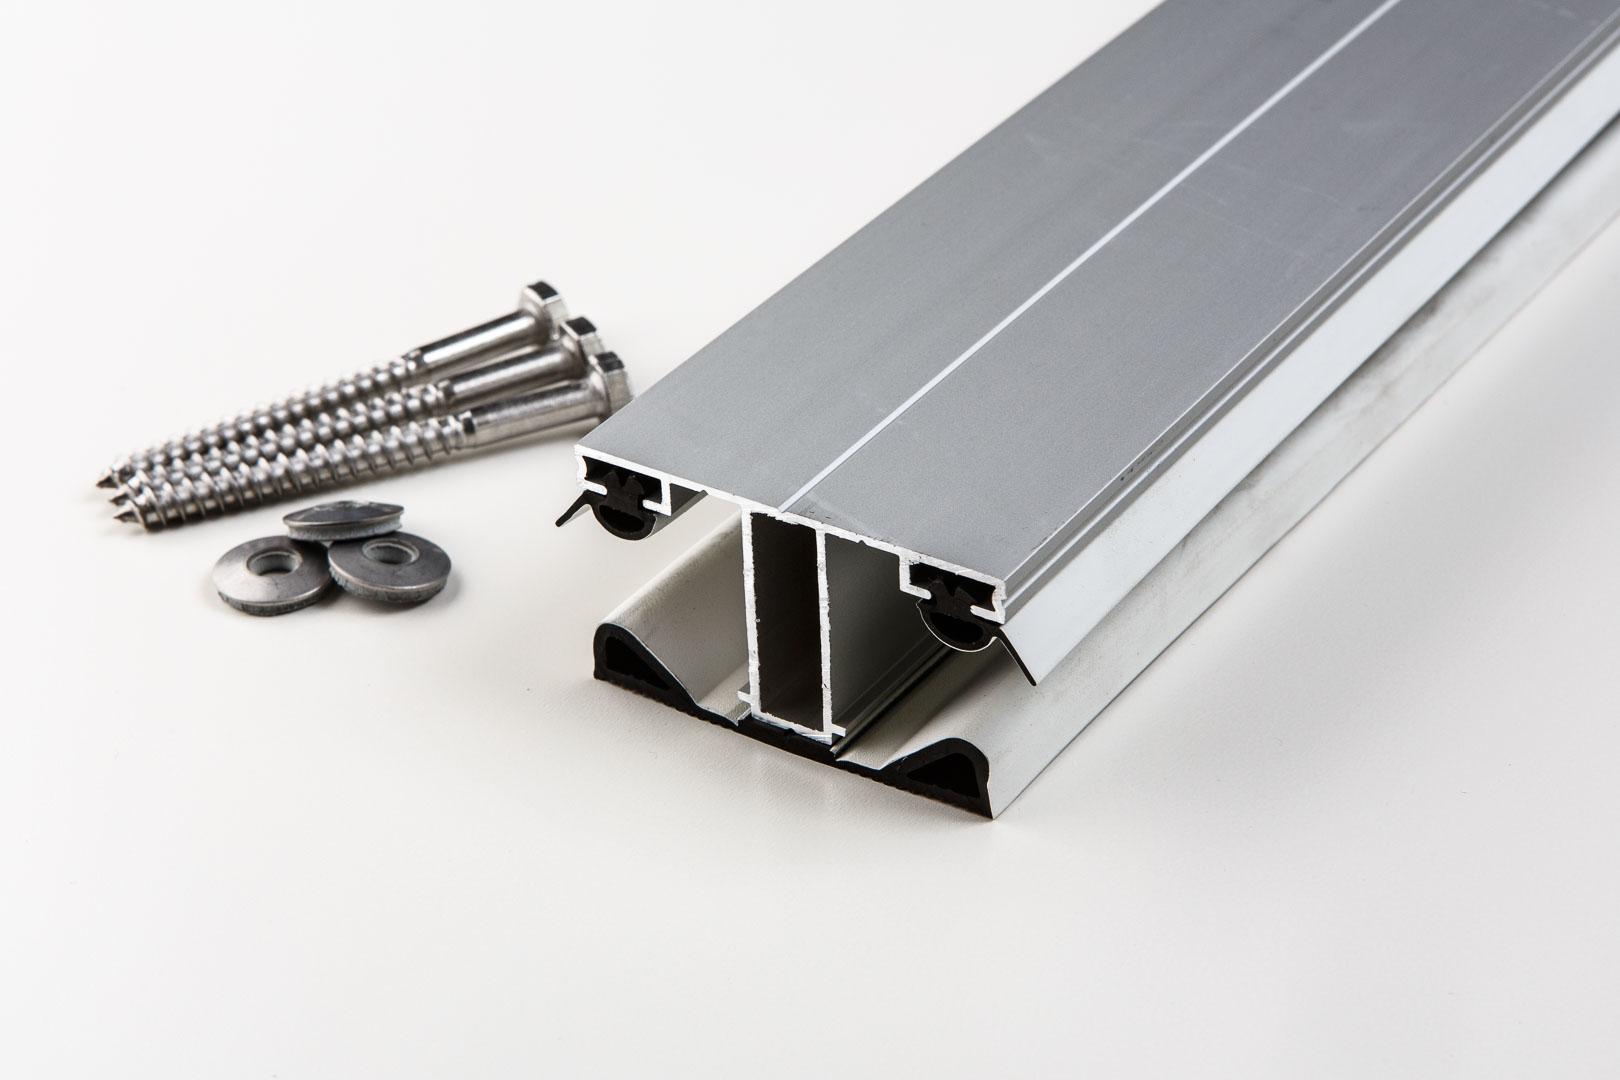 Verlegeprofil Aluminium 8 mm Stegplatten oder Glas Mittelprofil Alu//Alu